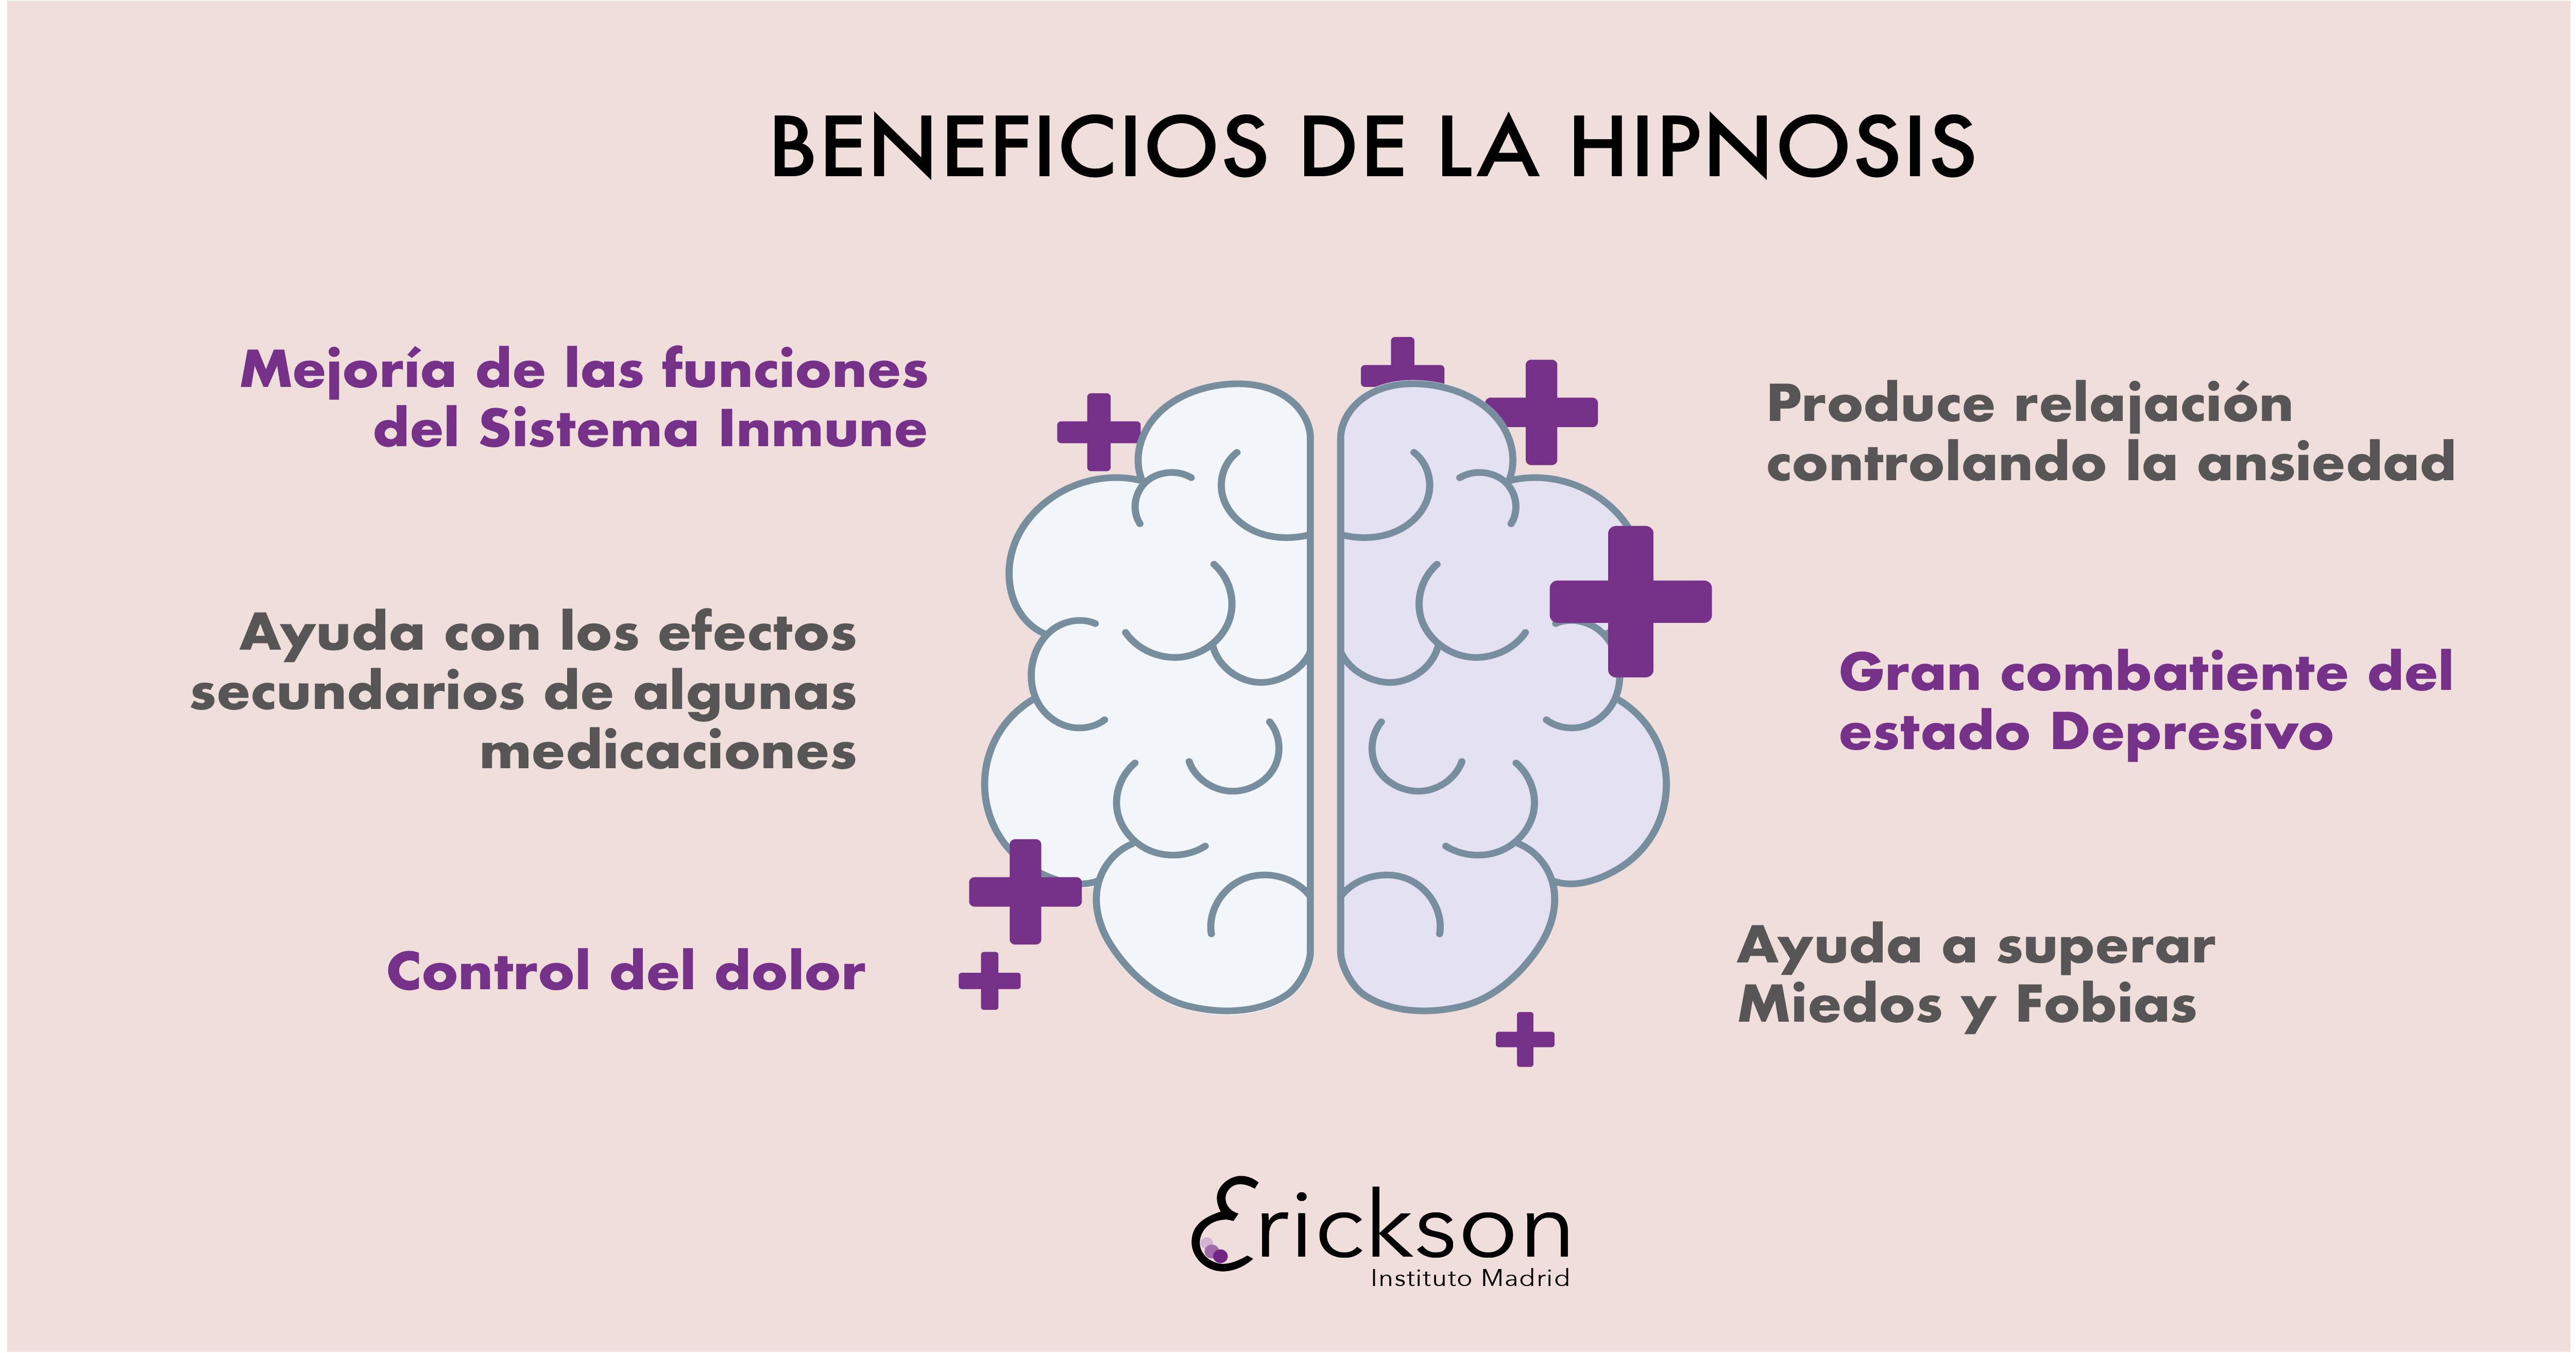 Beneficios de la Hipnosis Instituto Erickson Madrid-01-01